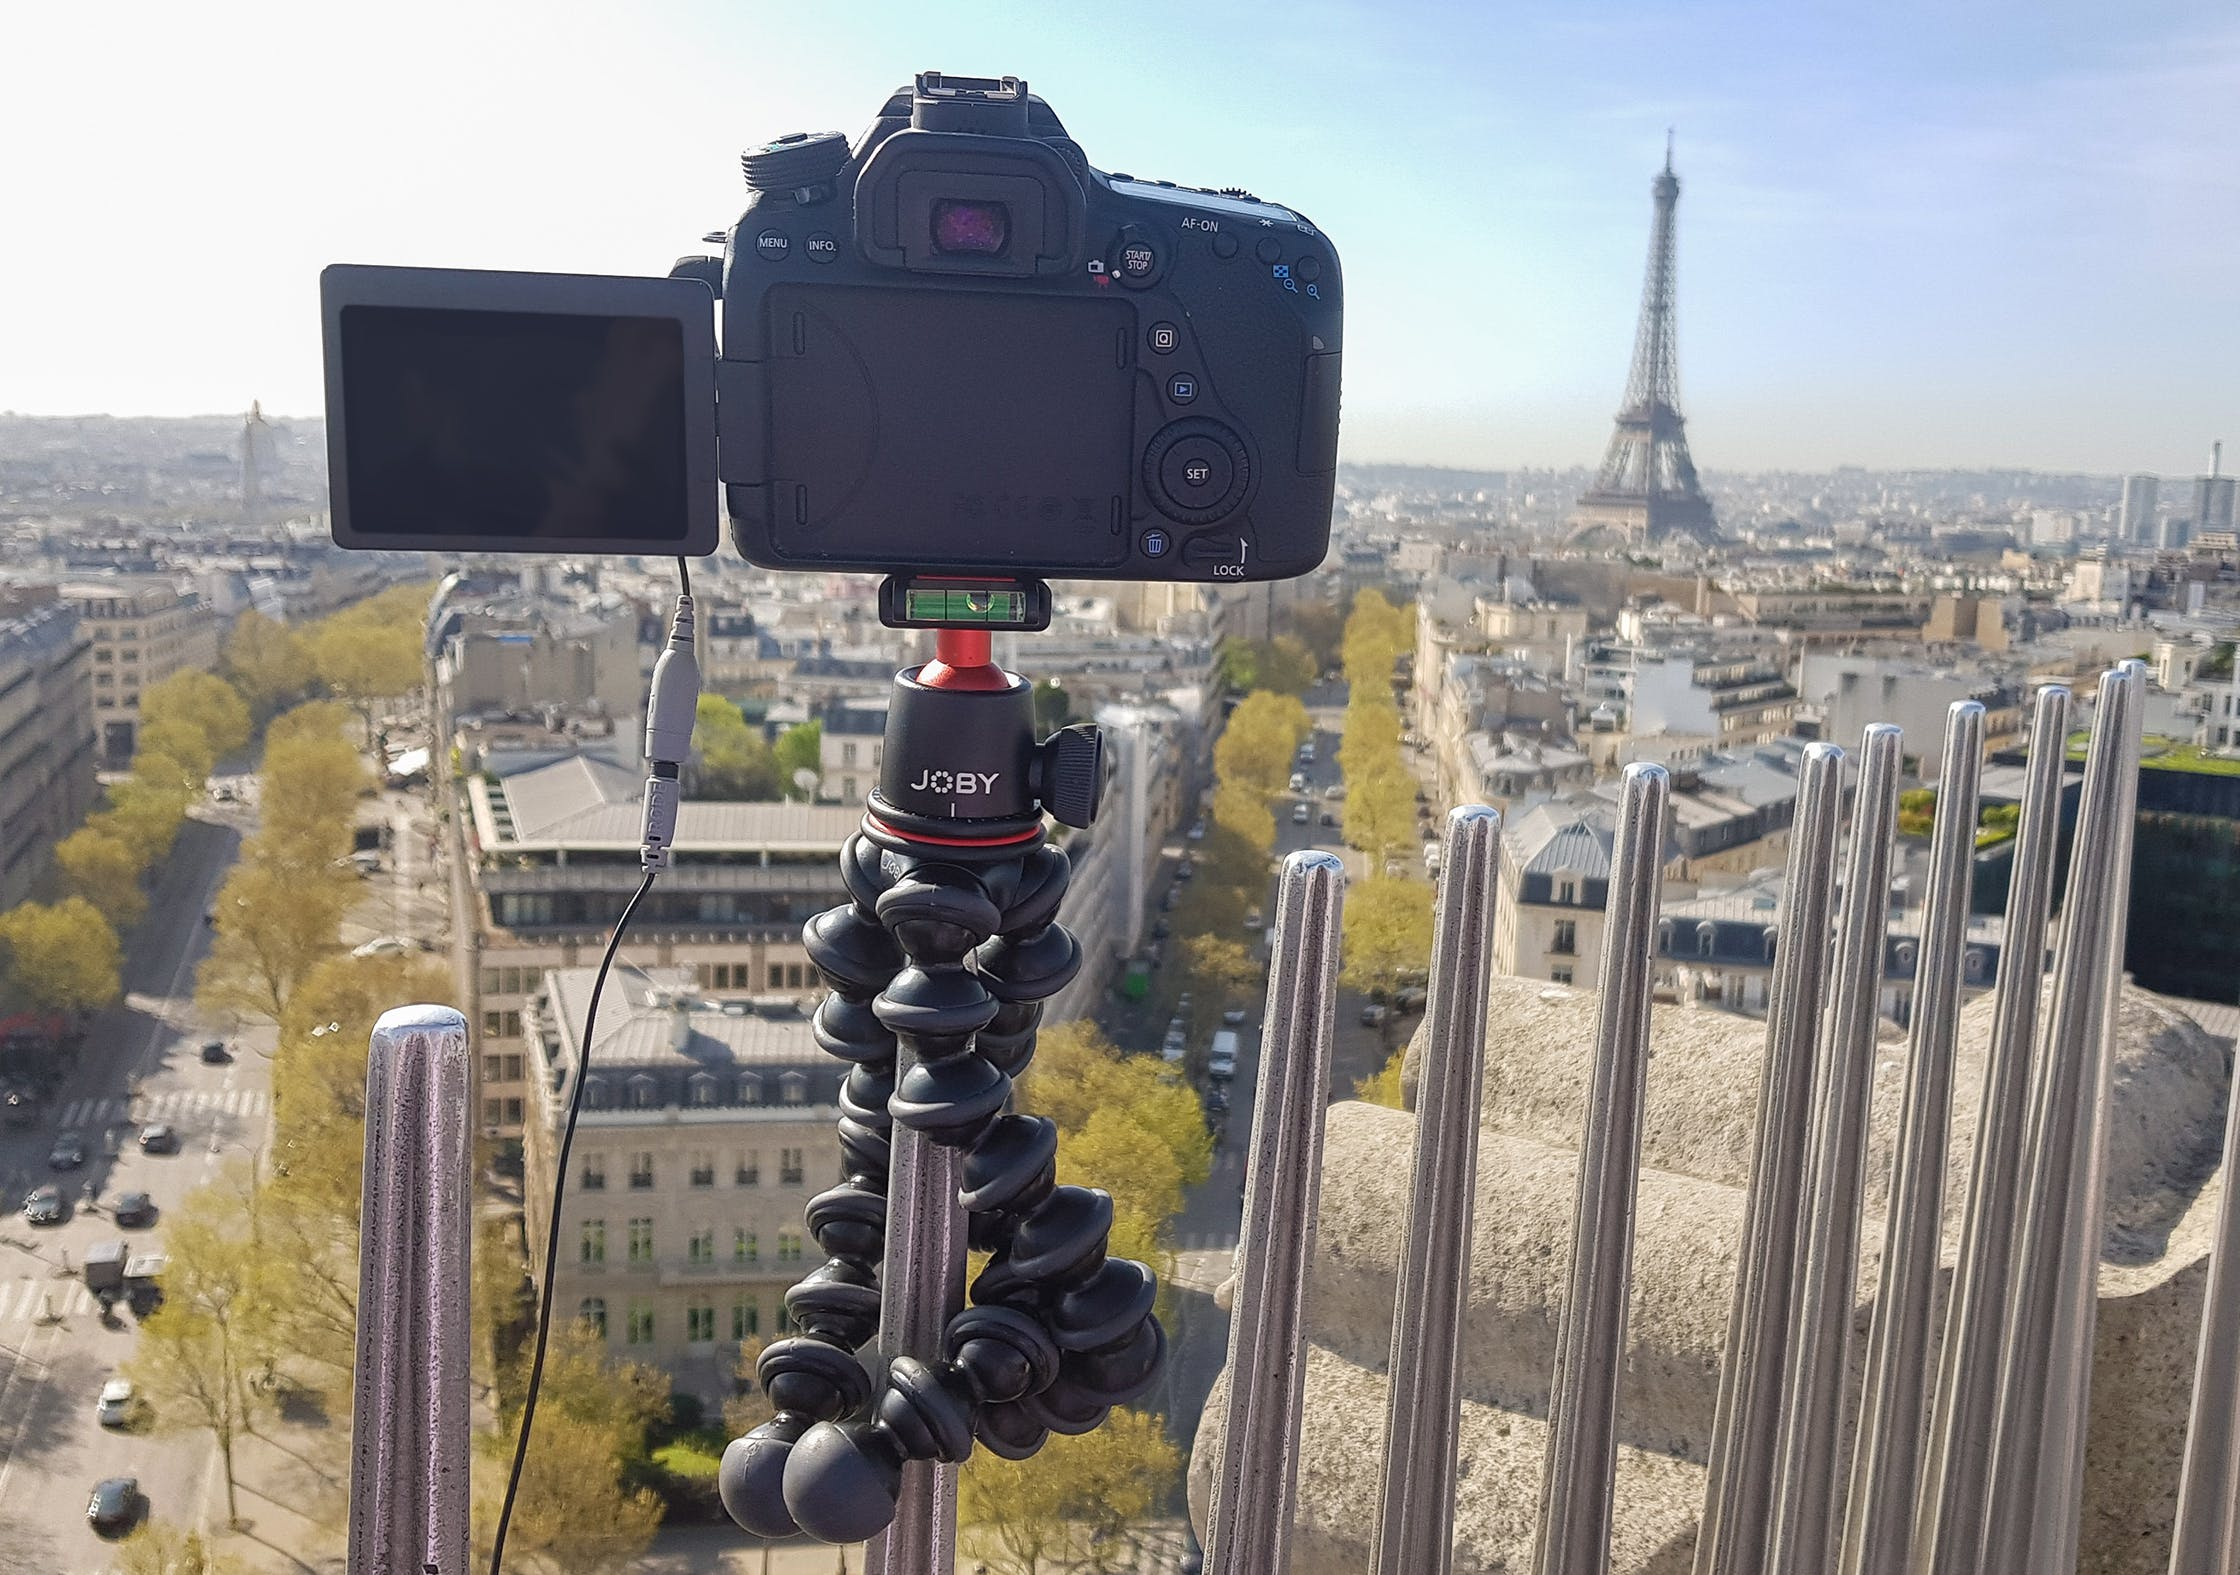 JOBY GorillaPod 3K On Top Of The Arc De Triomphe In Paris, France 1